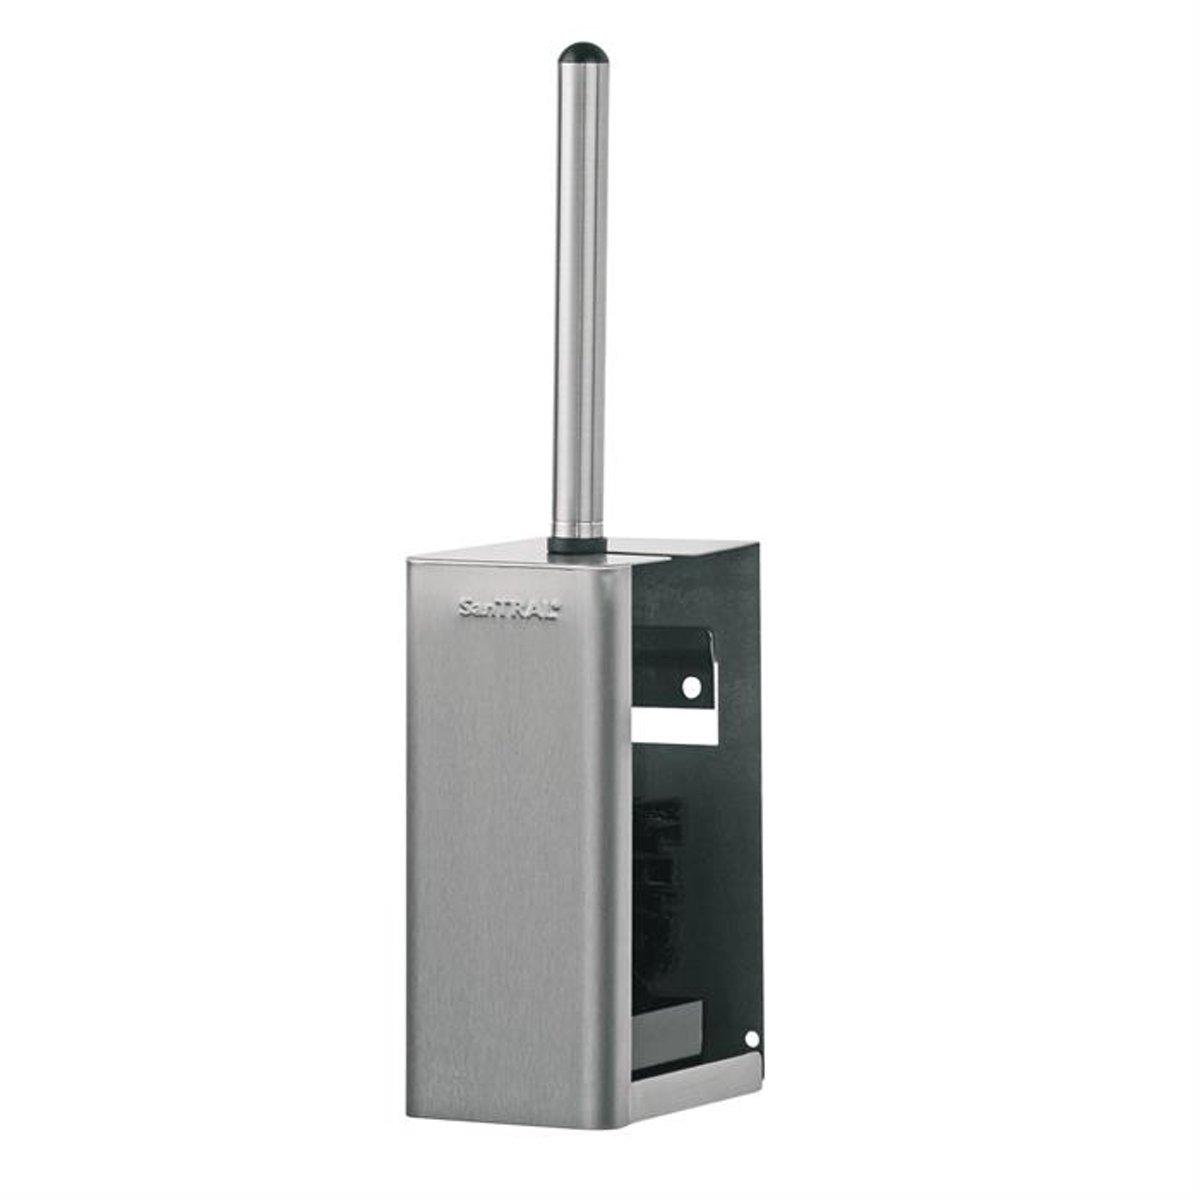 Toiletborstelhouder van RVS met muurbeugel Ophardt Hygiene SanTRAL WBU 3 kopen